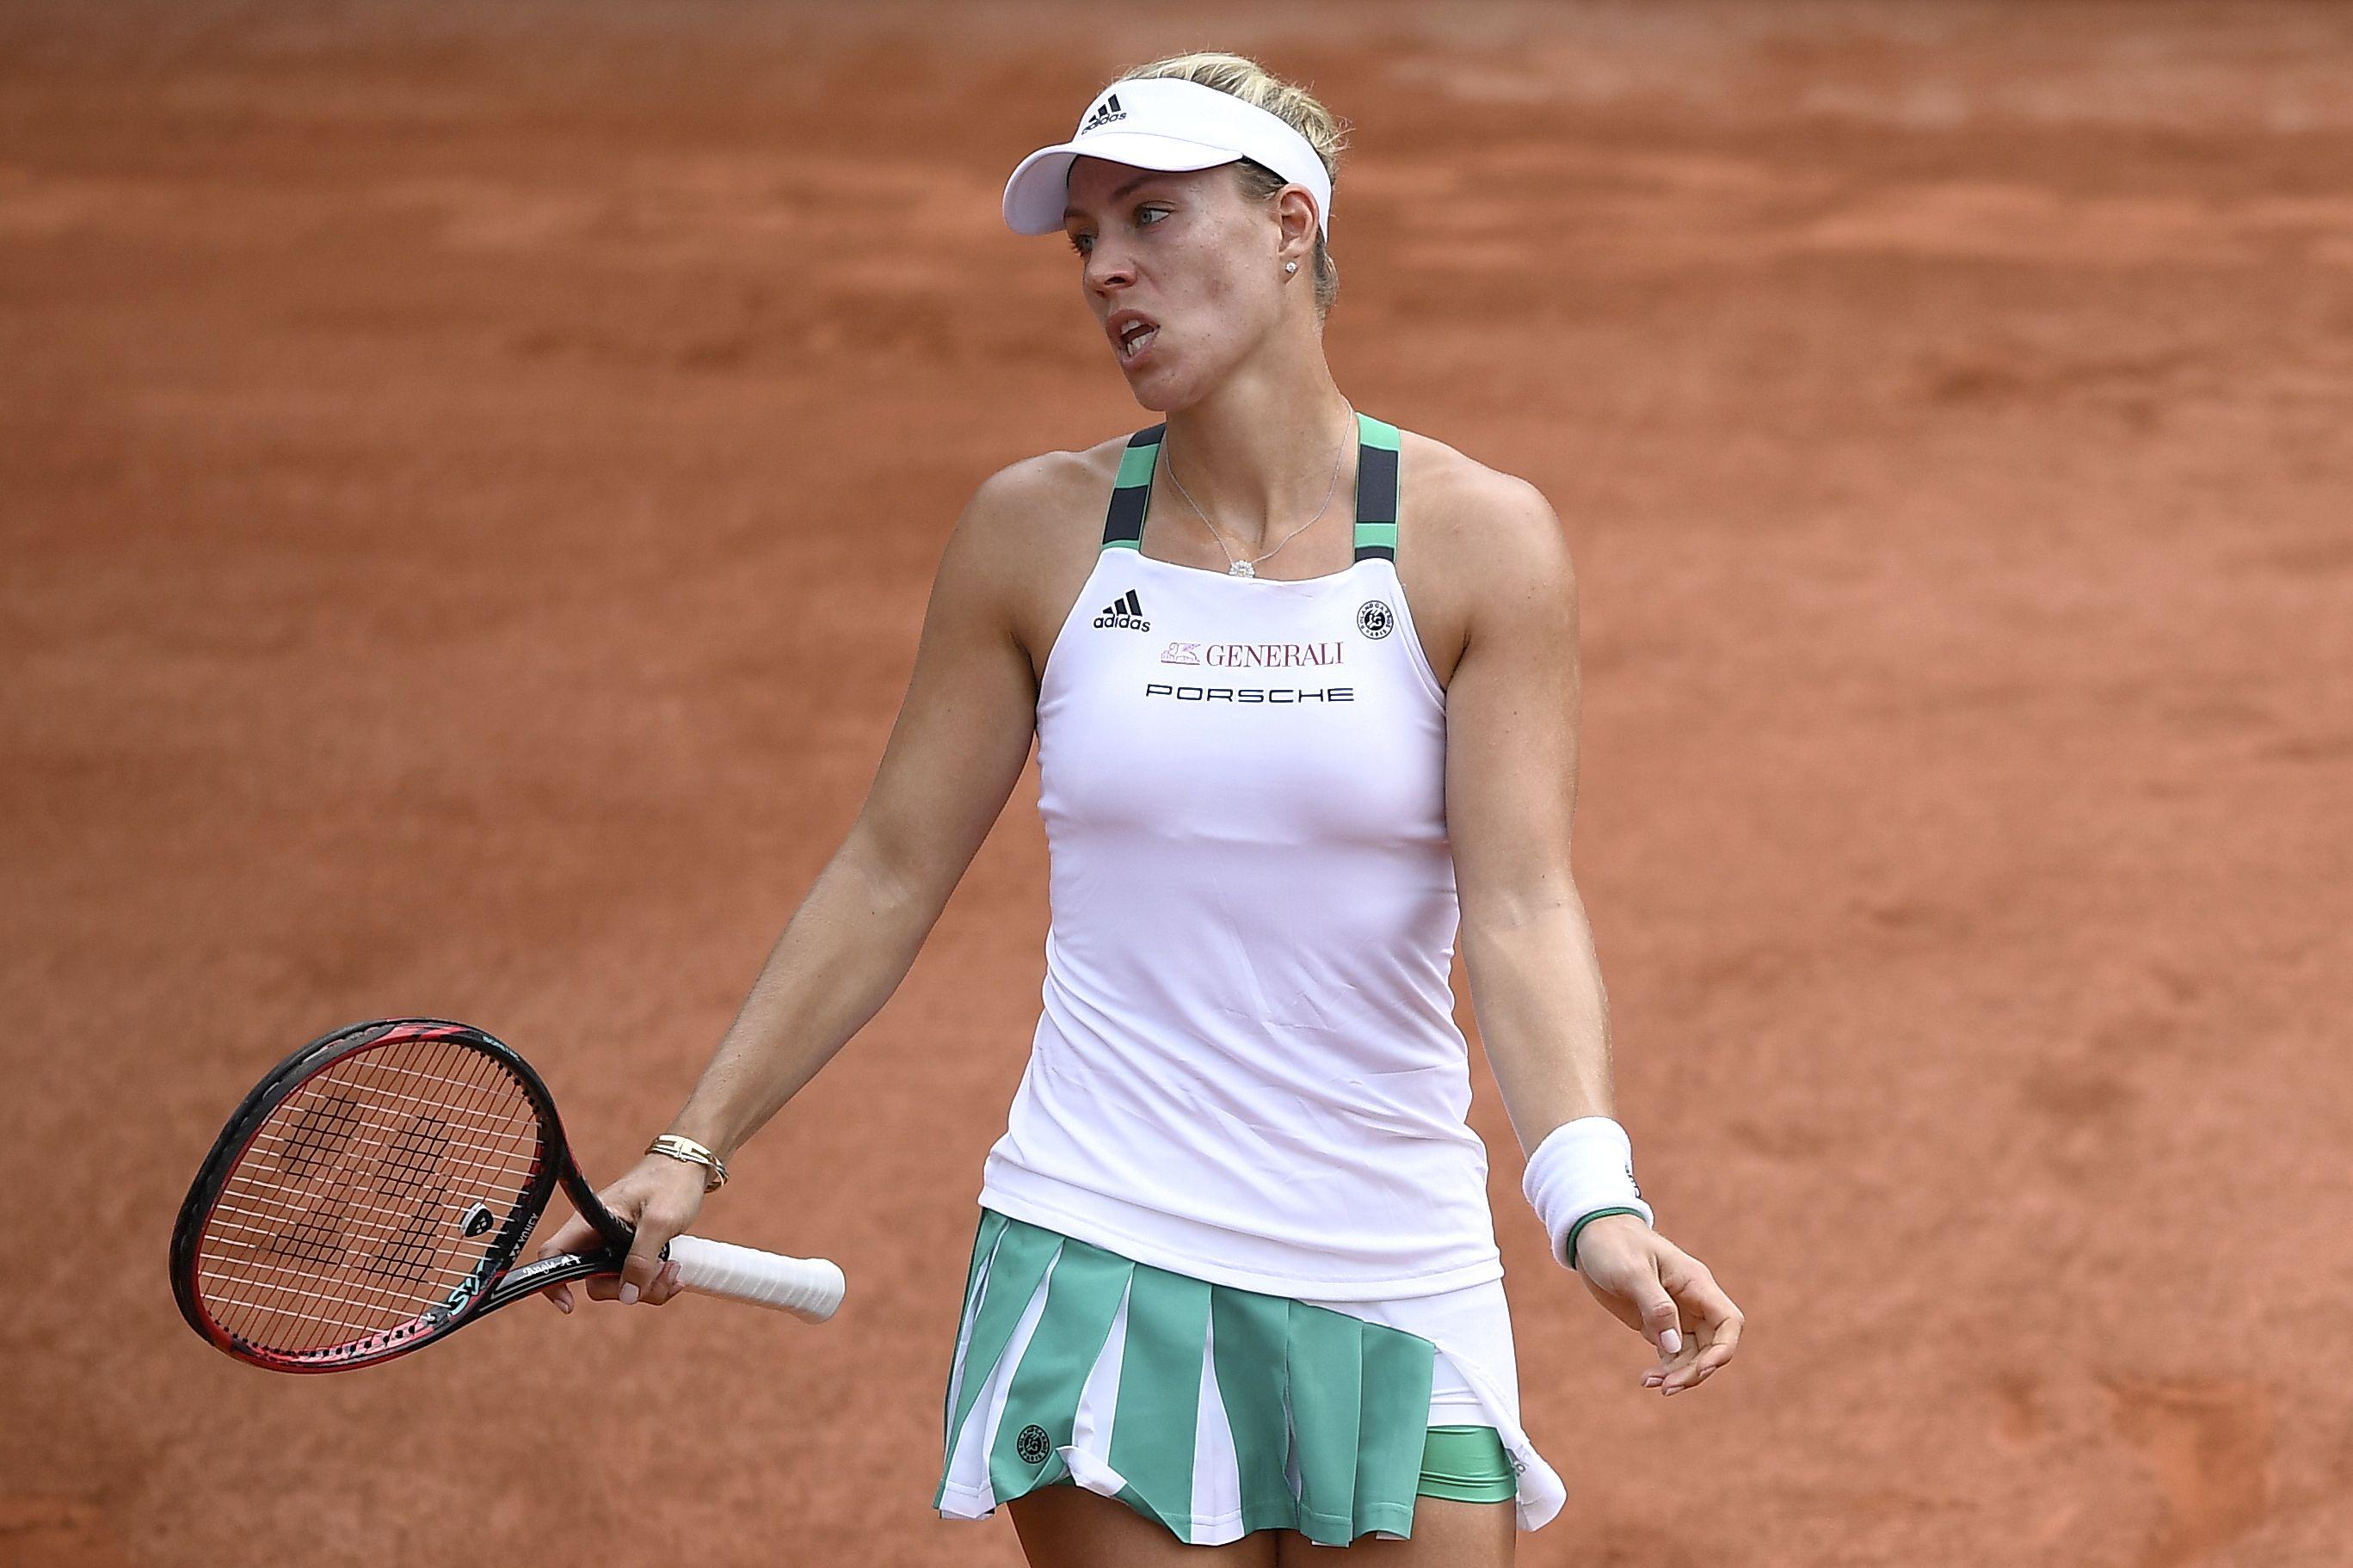 Verliererin Kerber, Gewinnerin Kvitova